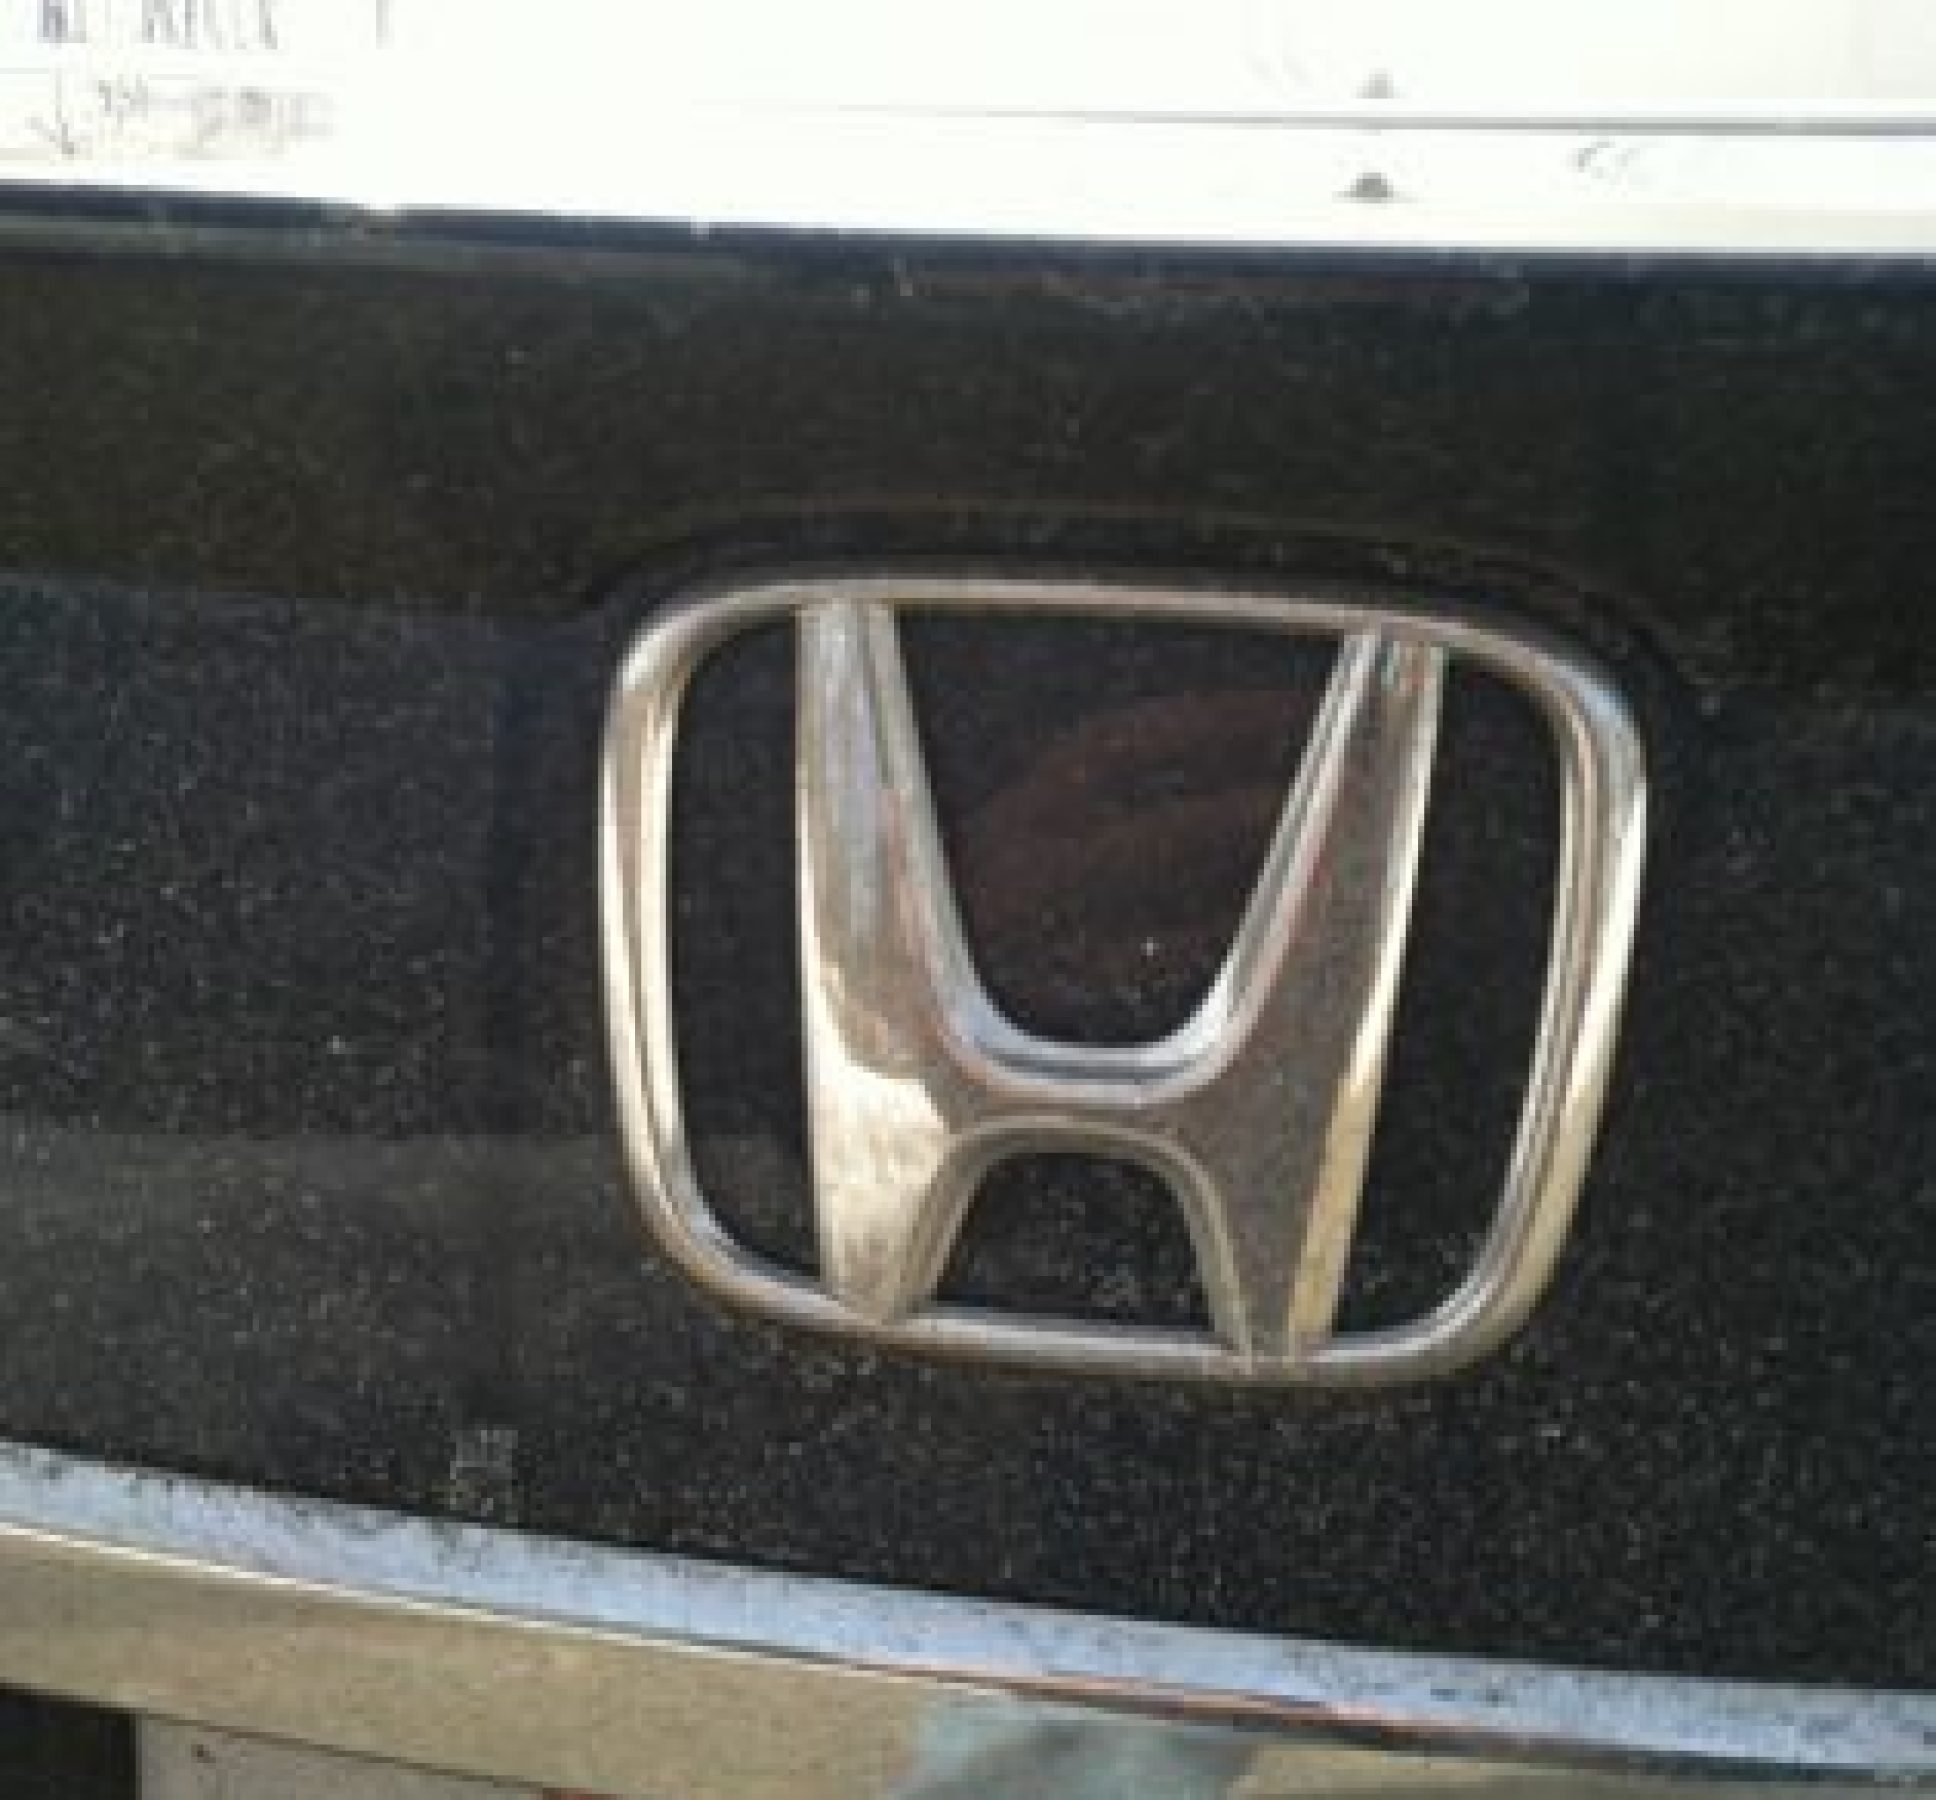 Honda electrified cars